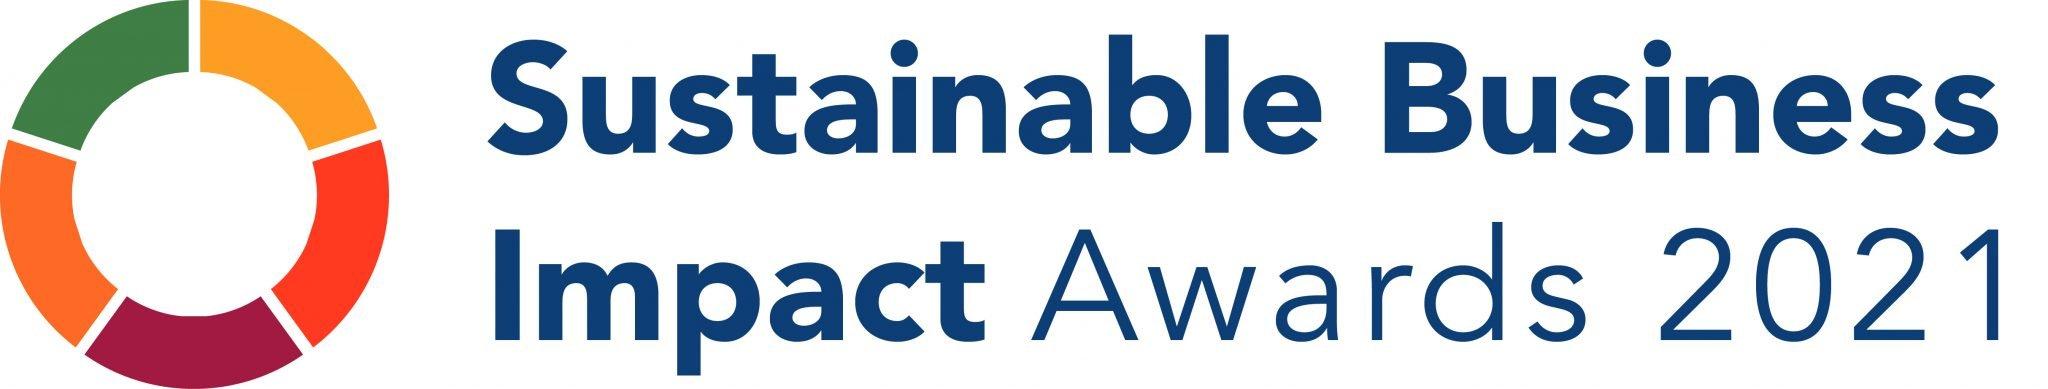 Chambers Ireland Sustainable Business Awards logo